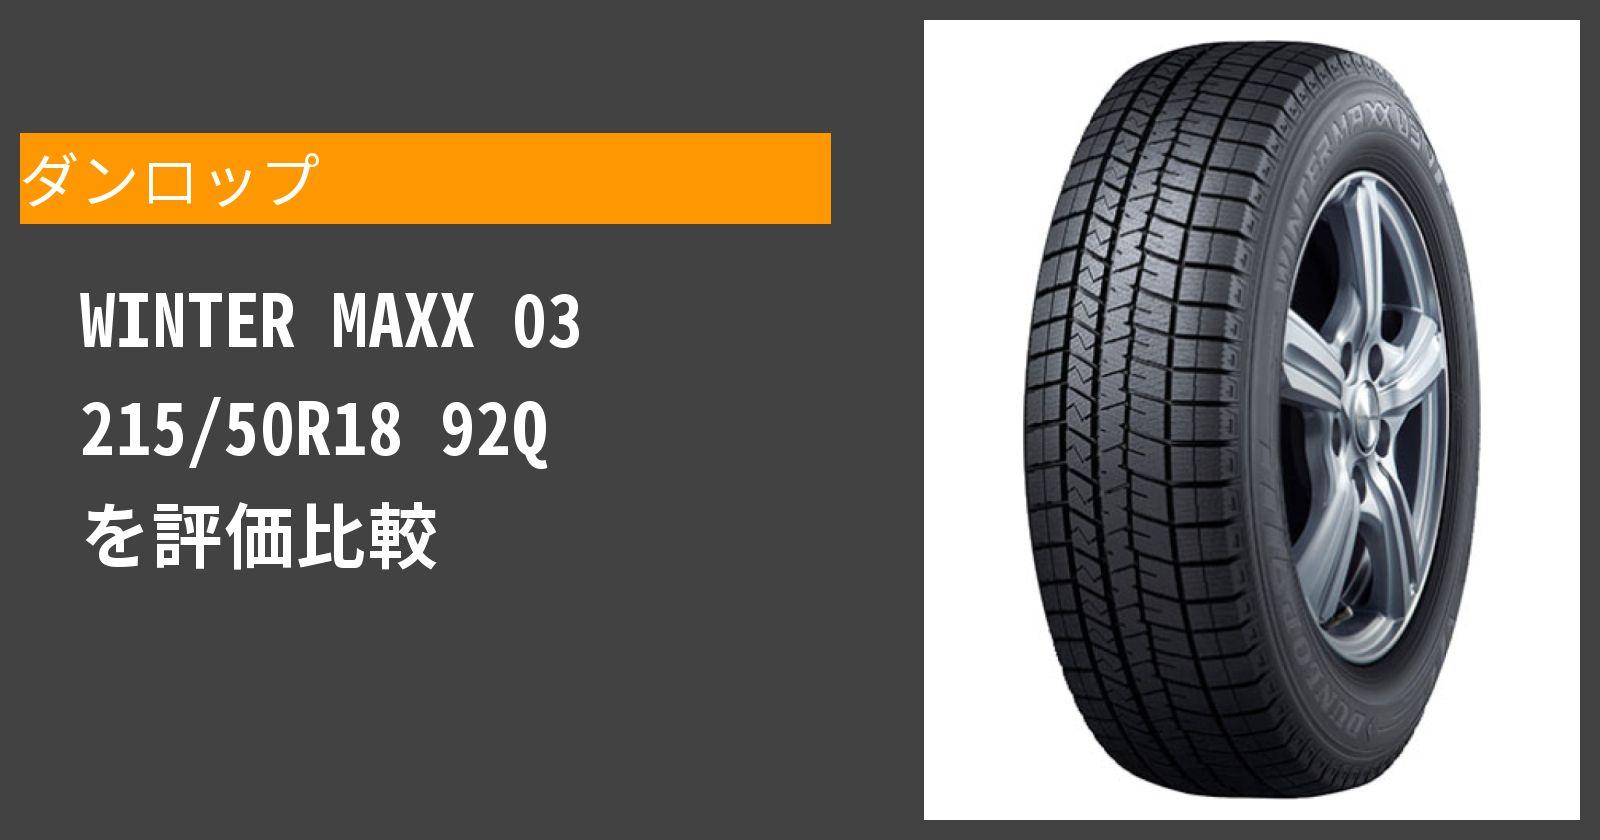 WINTER MAXX 03 215/50R18 92Qを徹底評価